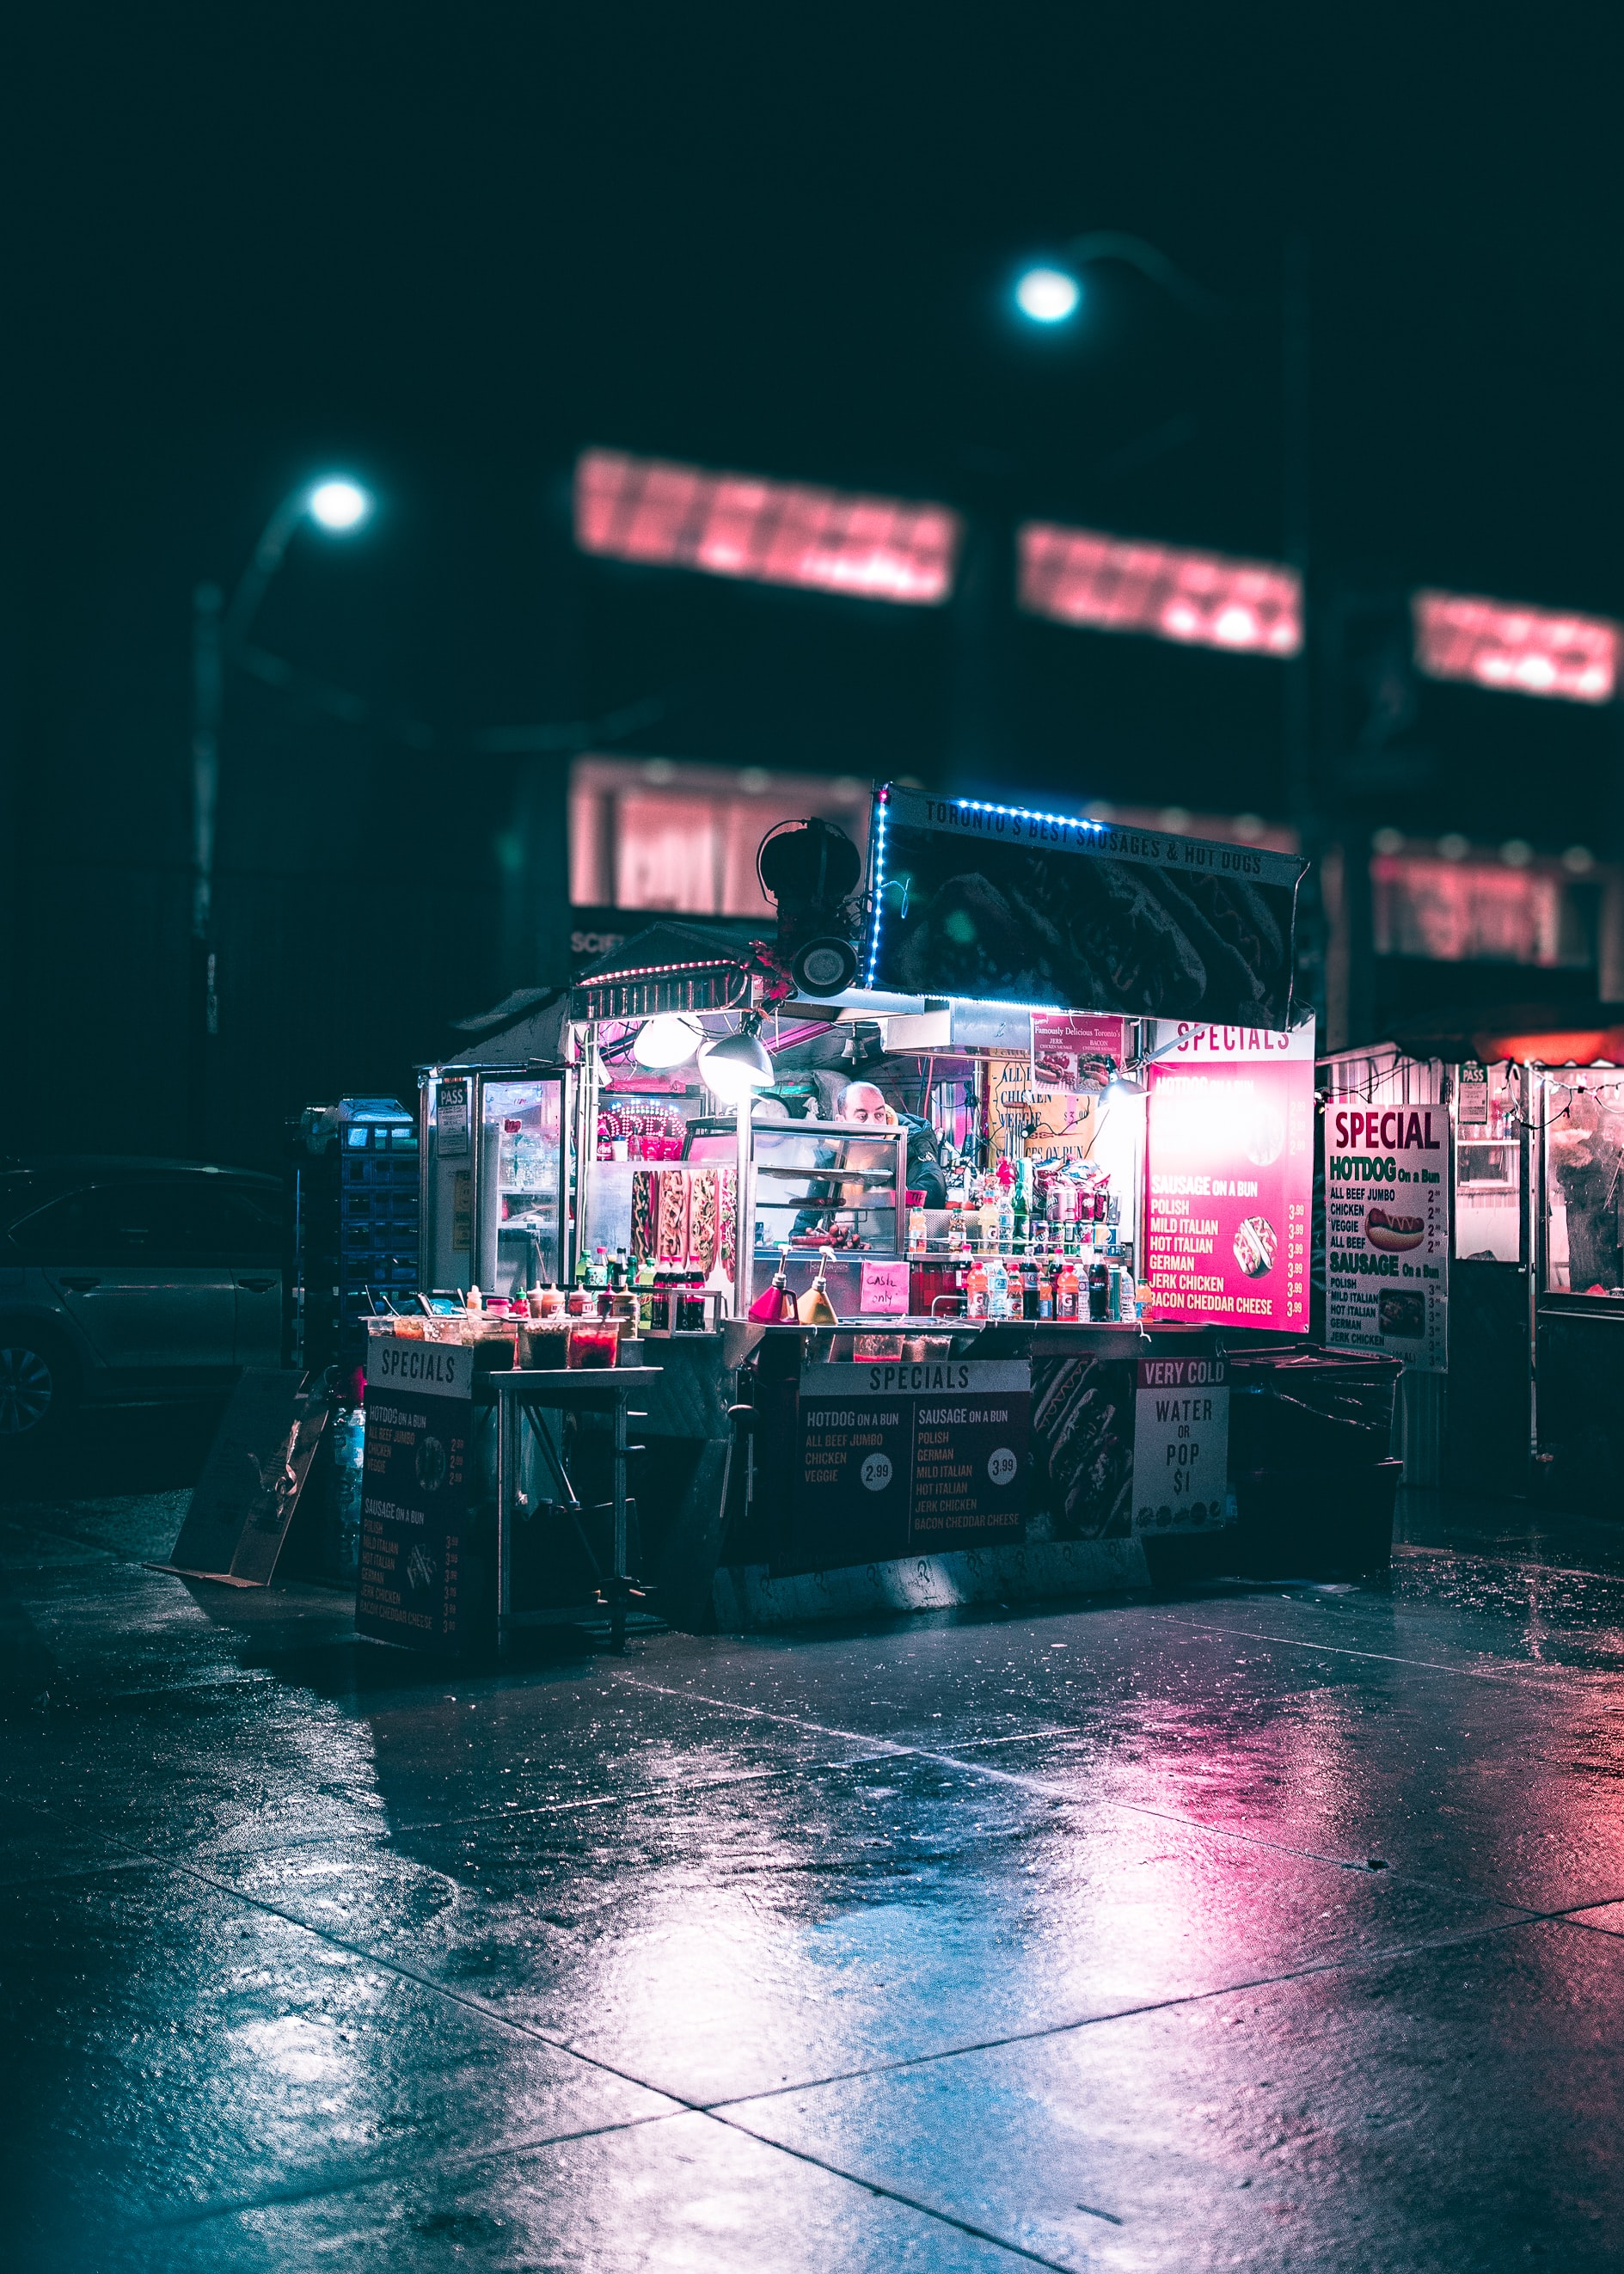 Urban hotdog vendor open and a late night in the city